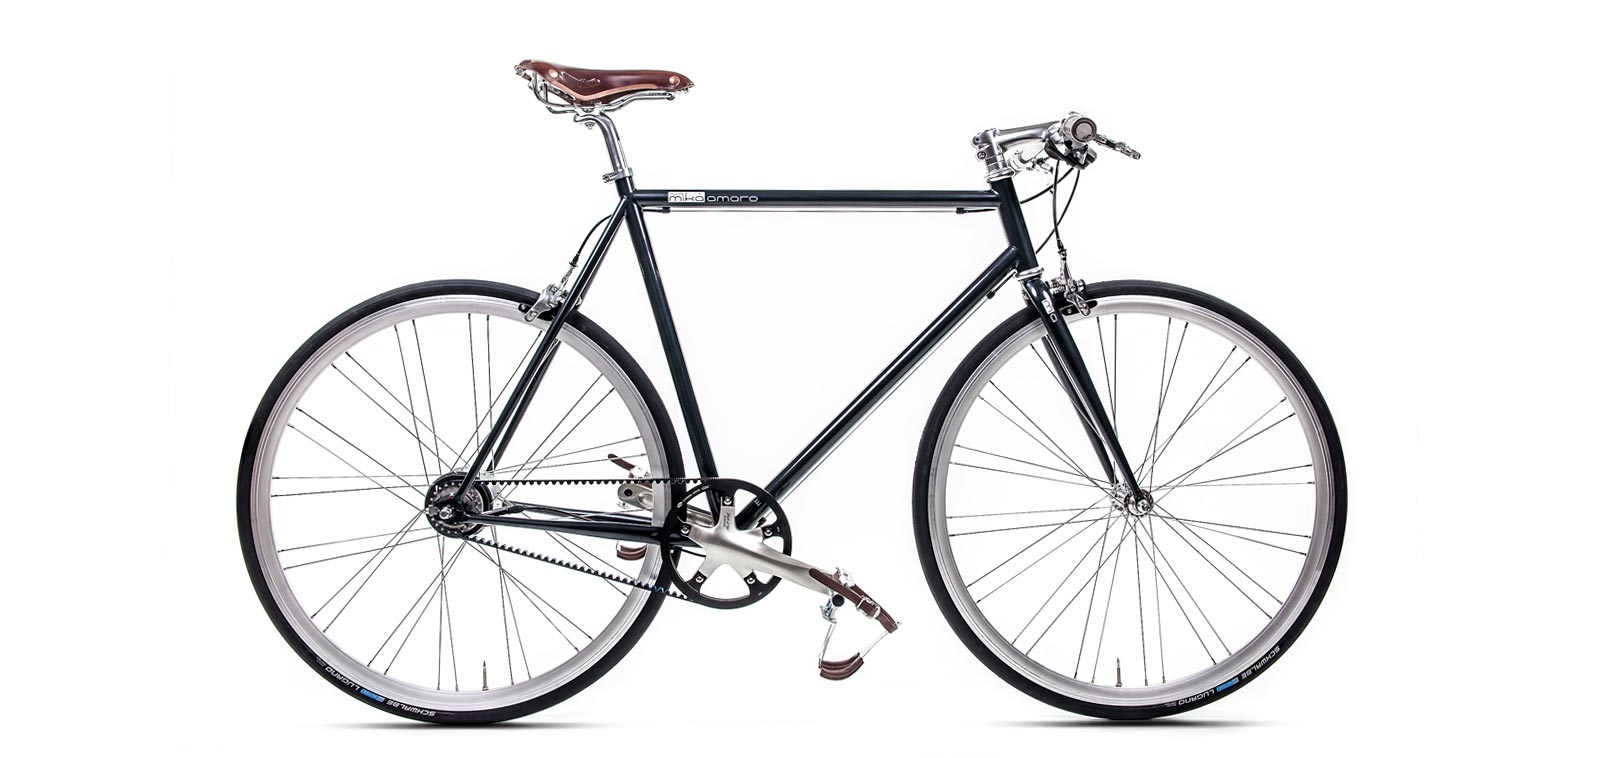 Mika amaro bikes